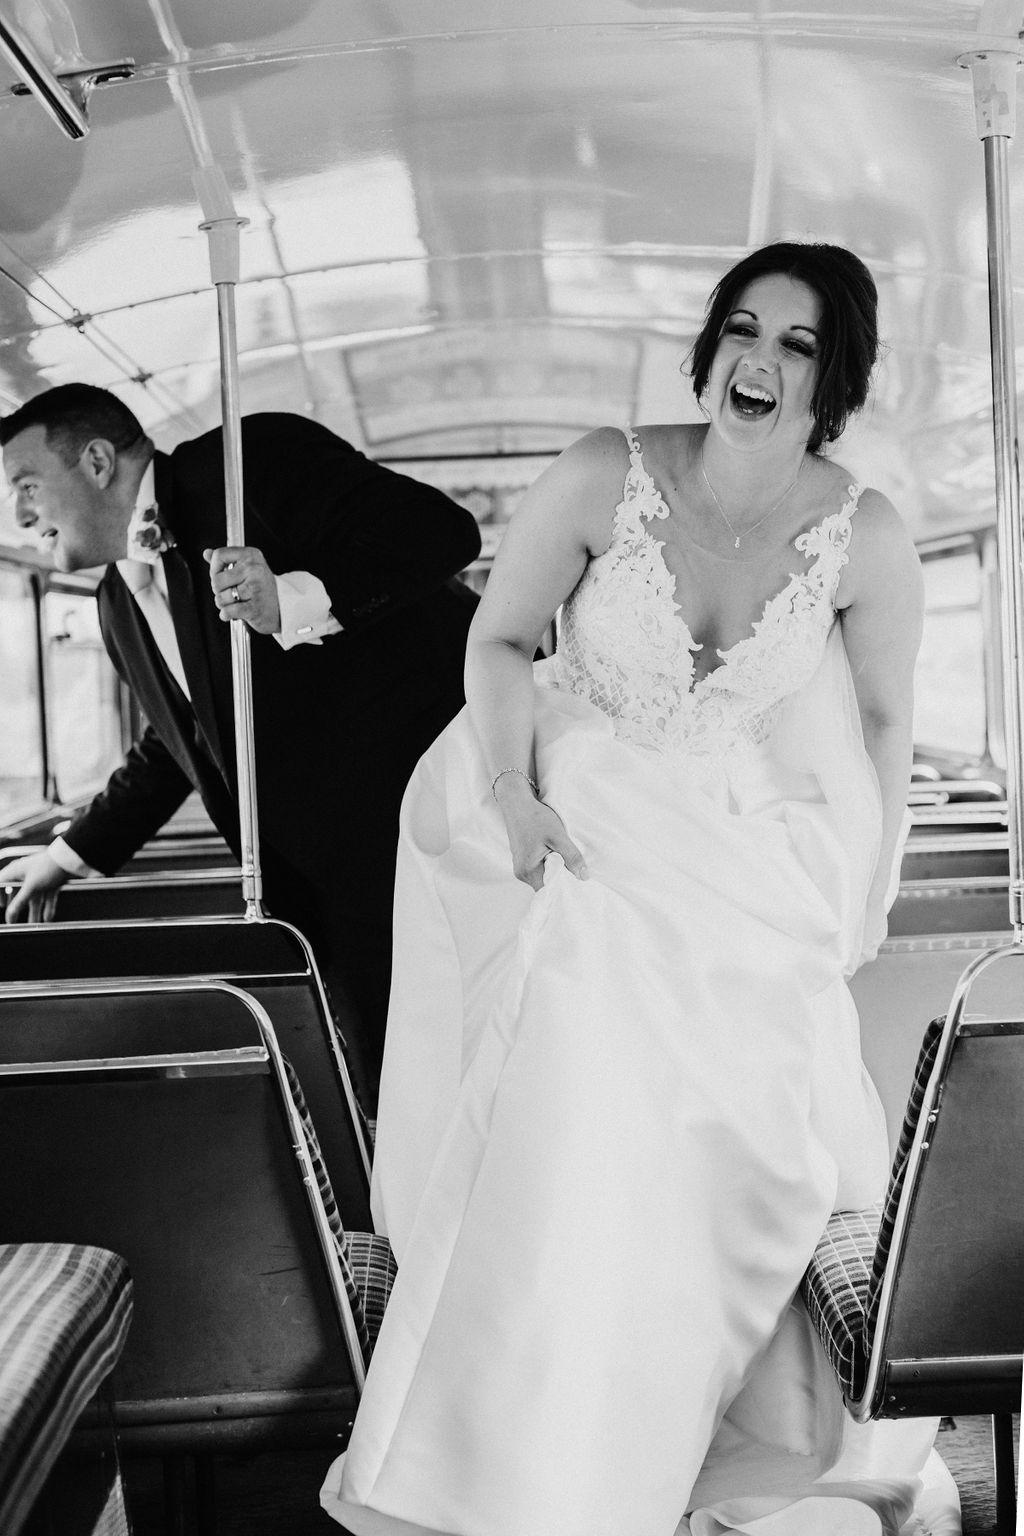 Your_Wedding_Day_280.jpg